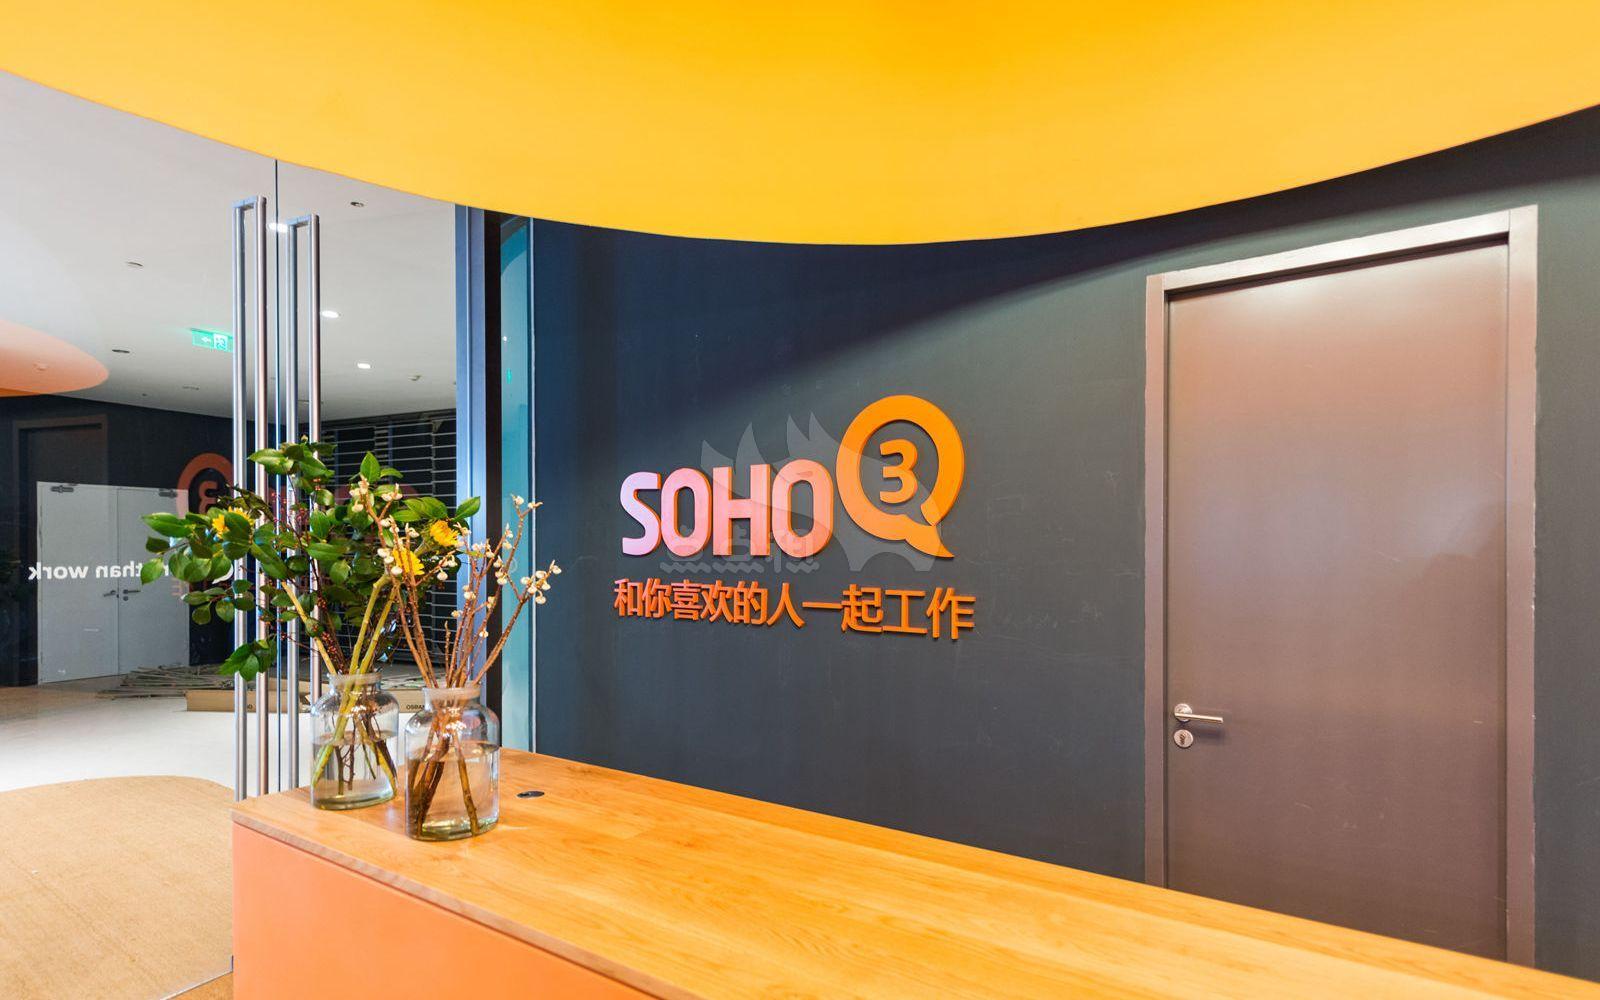 SOHO3Q-光华路SOHO二期